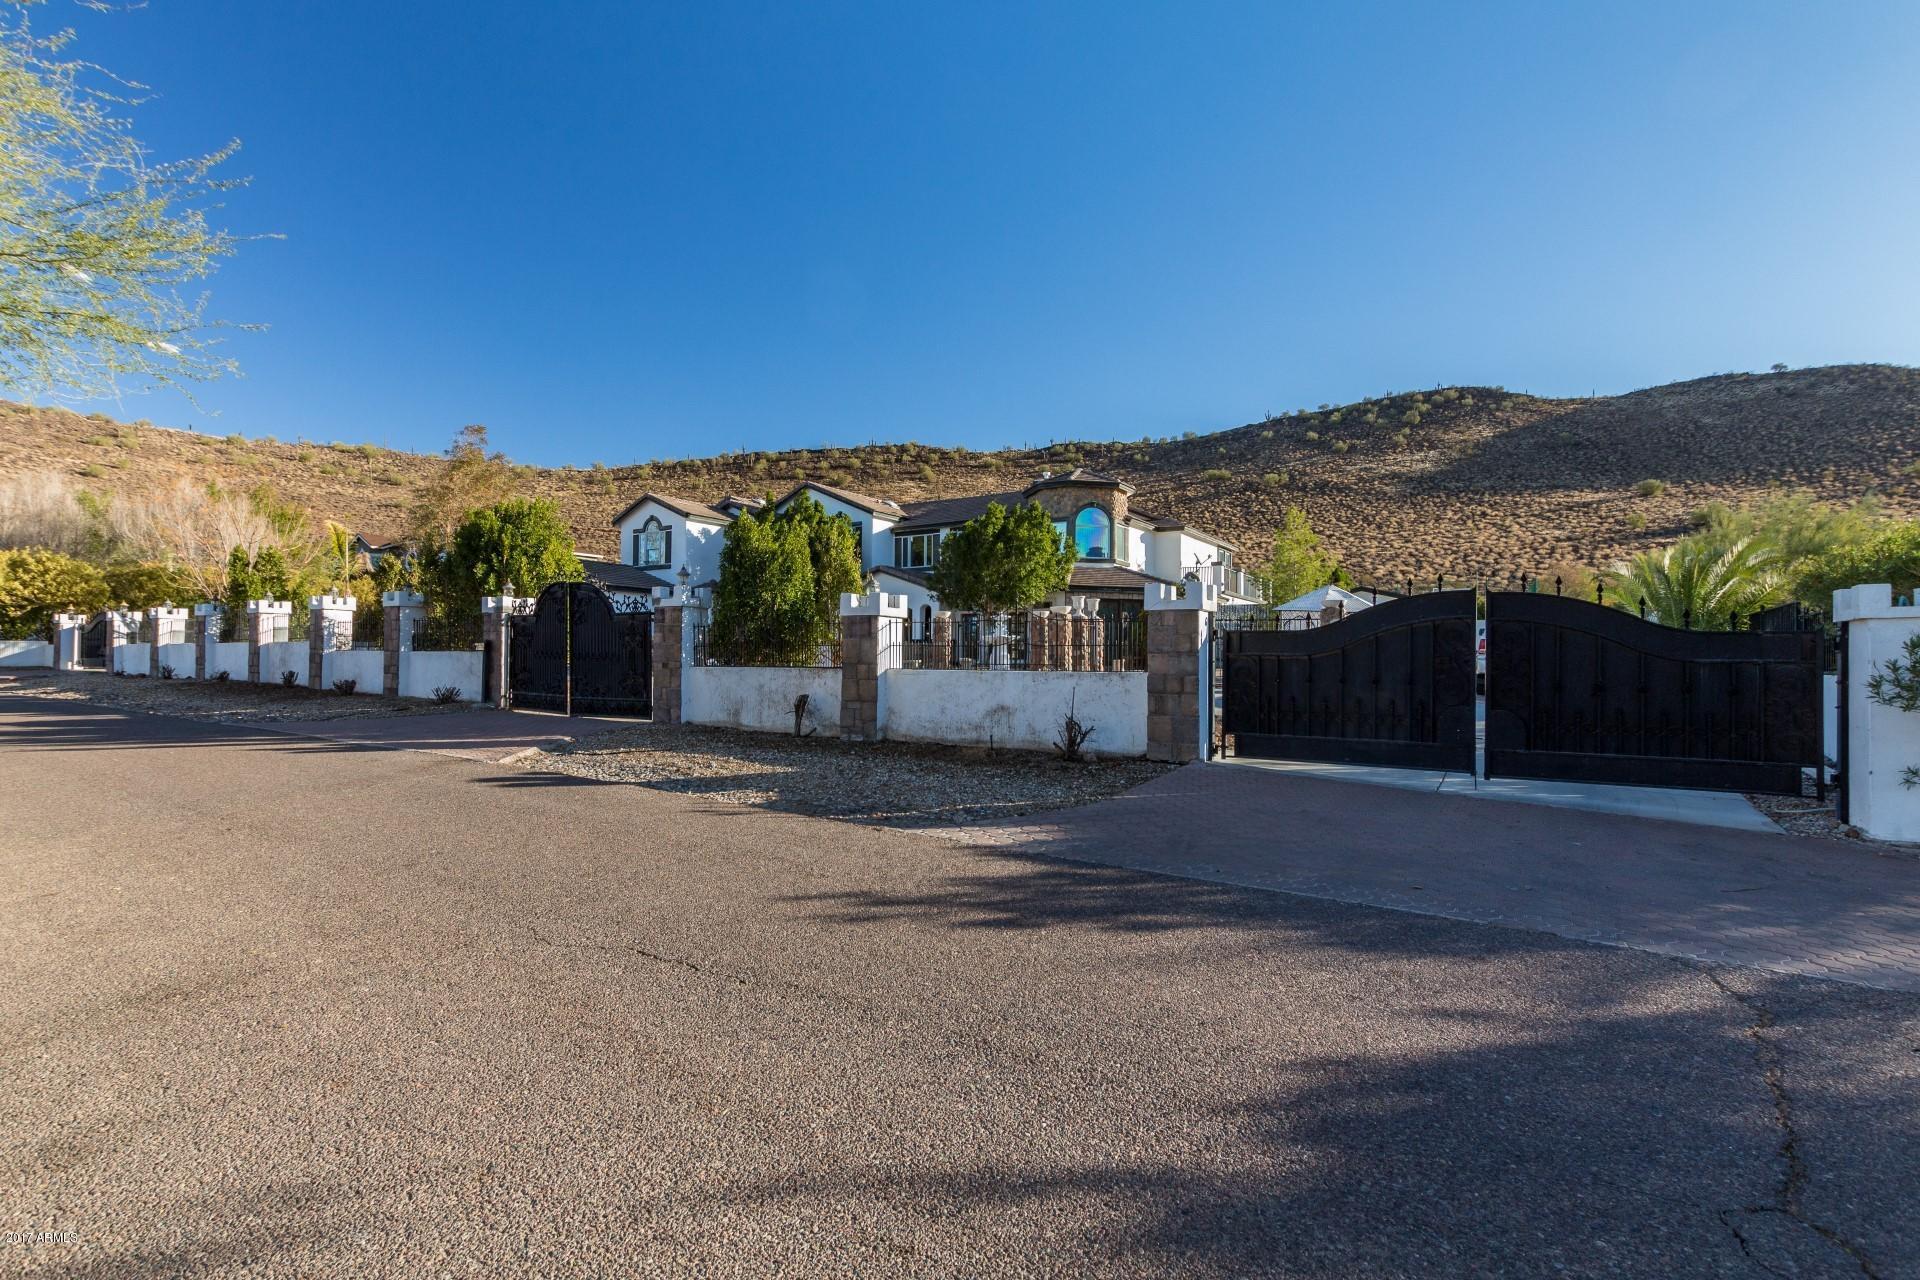 MLS 5701115 23185 N 61ST Drive, Glendale, AZ 85310 Glendale AZ Scenic